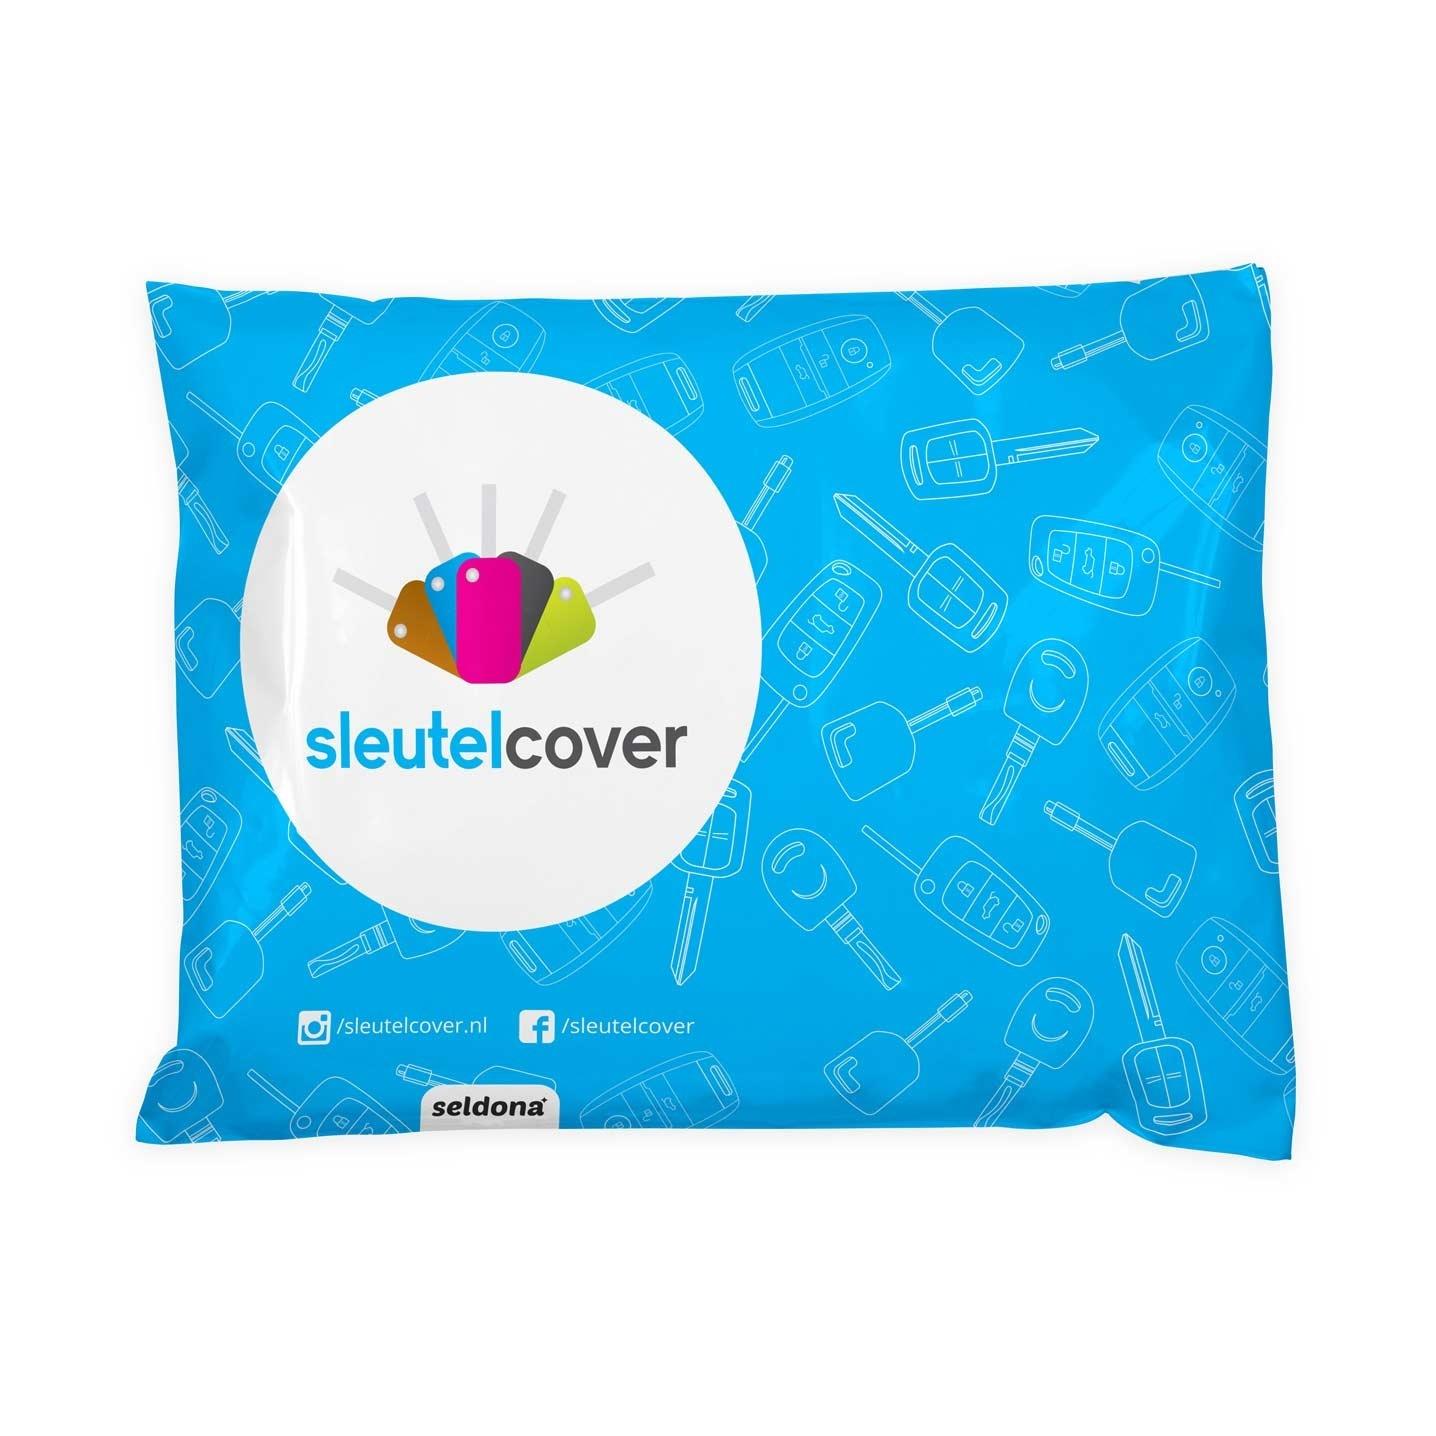 Suzuki SleutelCover - Oranje / Silicone sleutelhoesje / beschermhoesje autosleutel